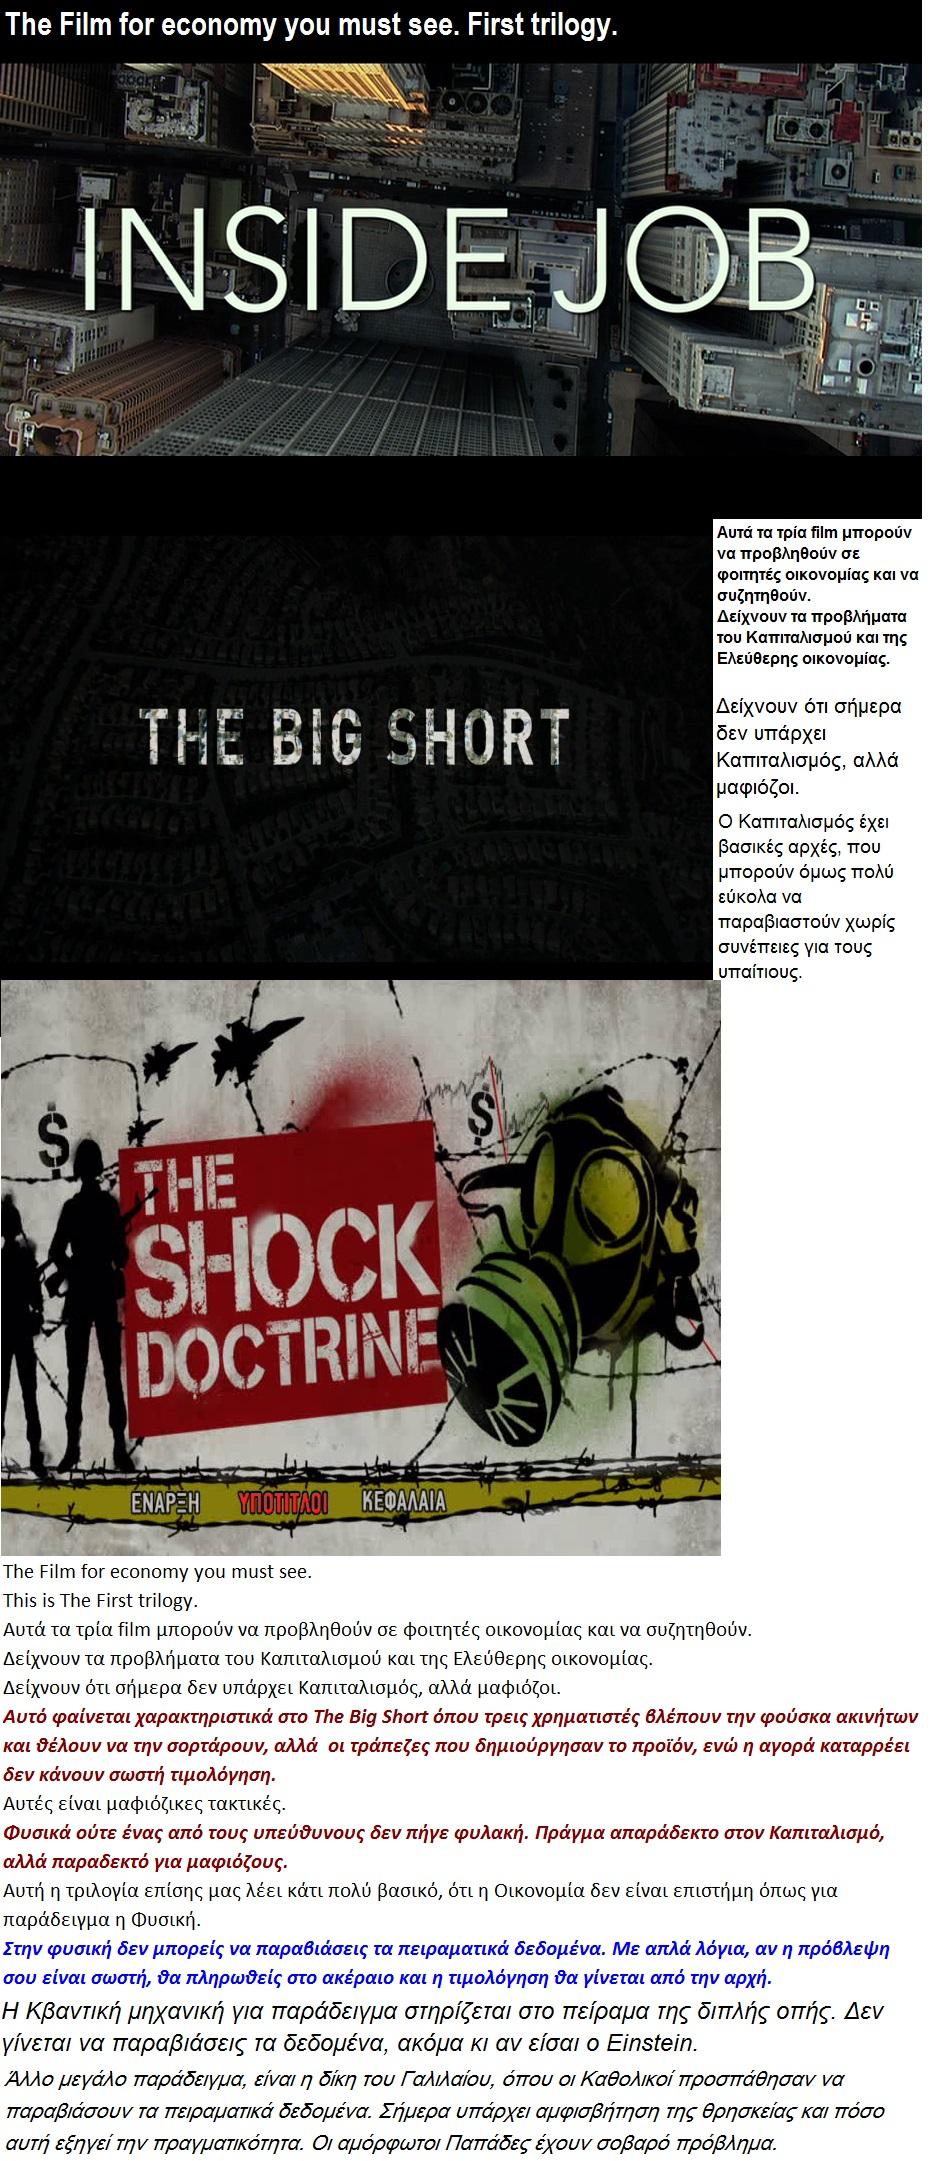 CINEMA ECONOMY THE BIG SHORT - INSIDE JOB - THE SHOCK 01 020616